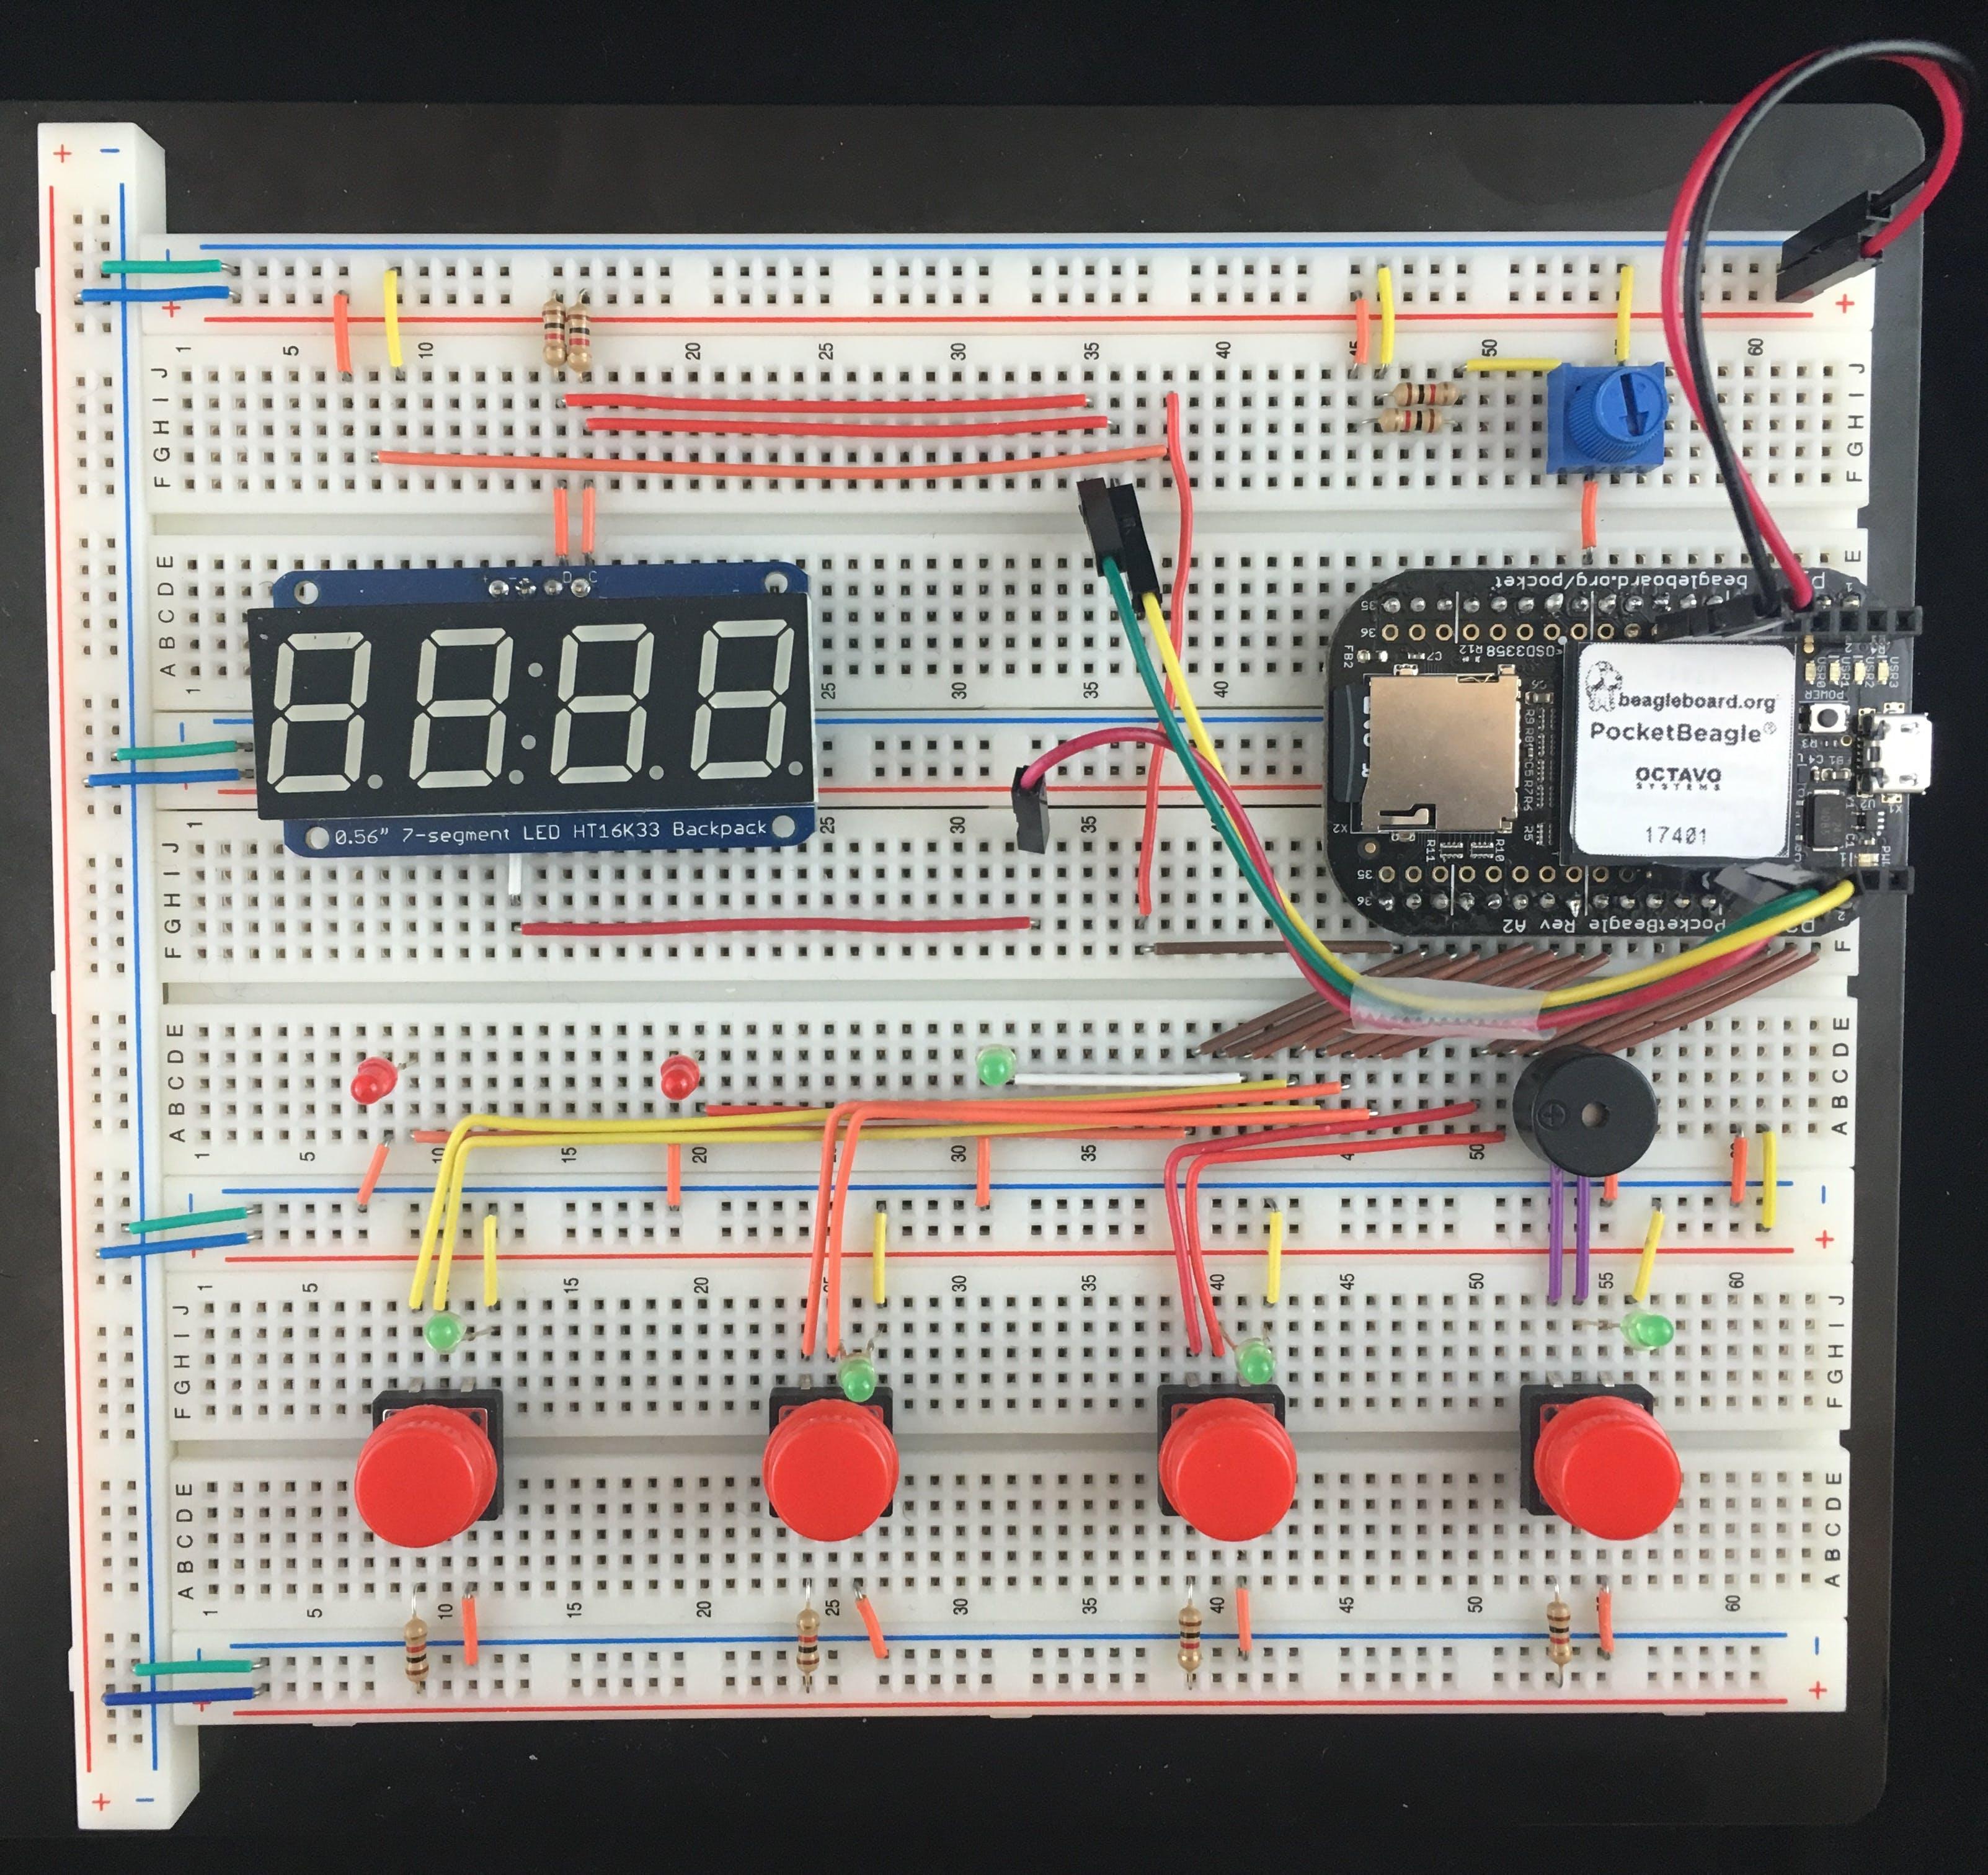 Hardware Layout for PocketBeagle Whac-A-Mole Game